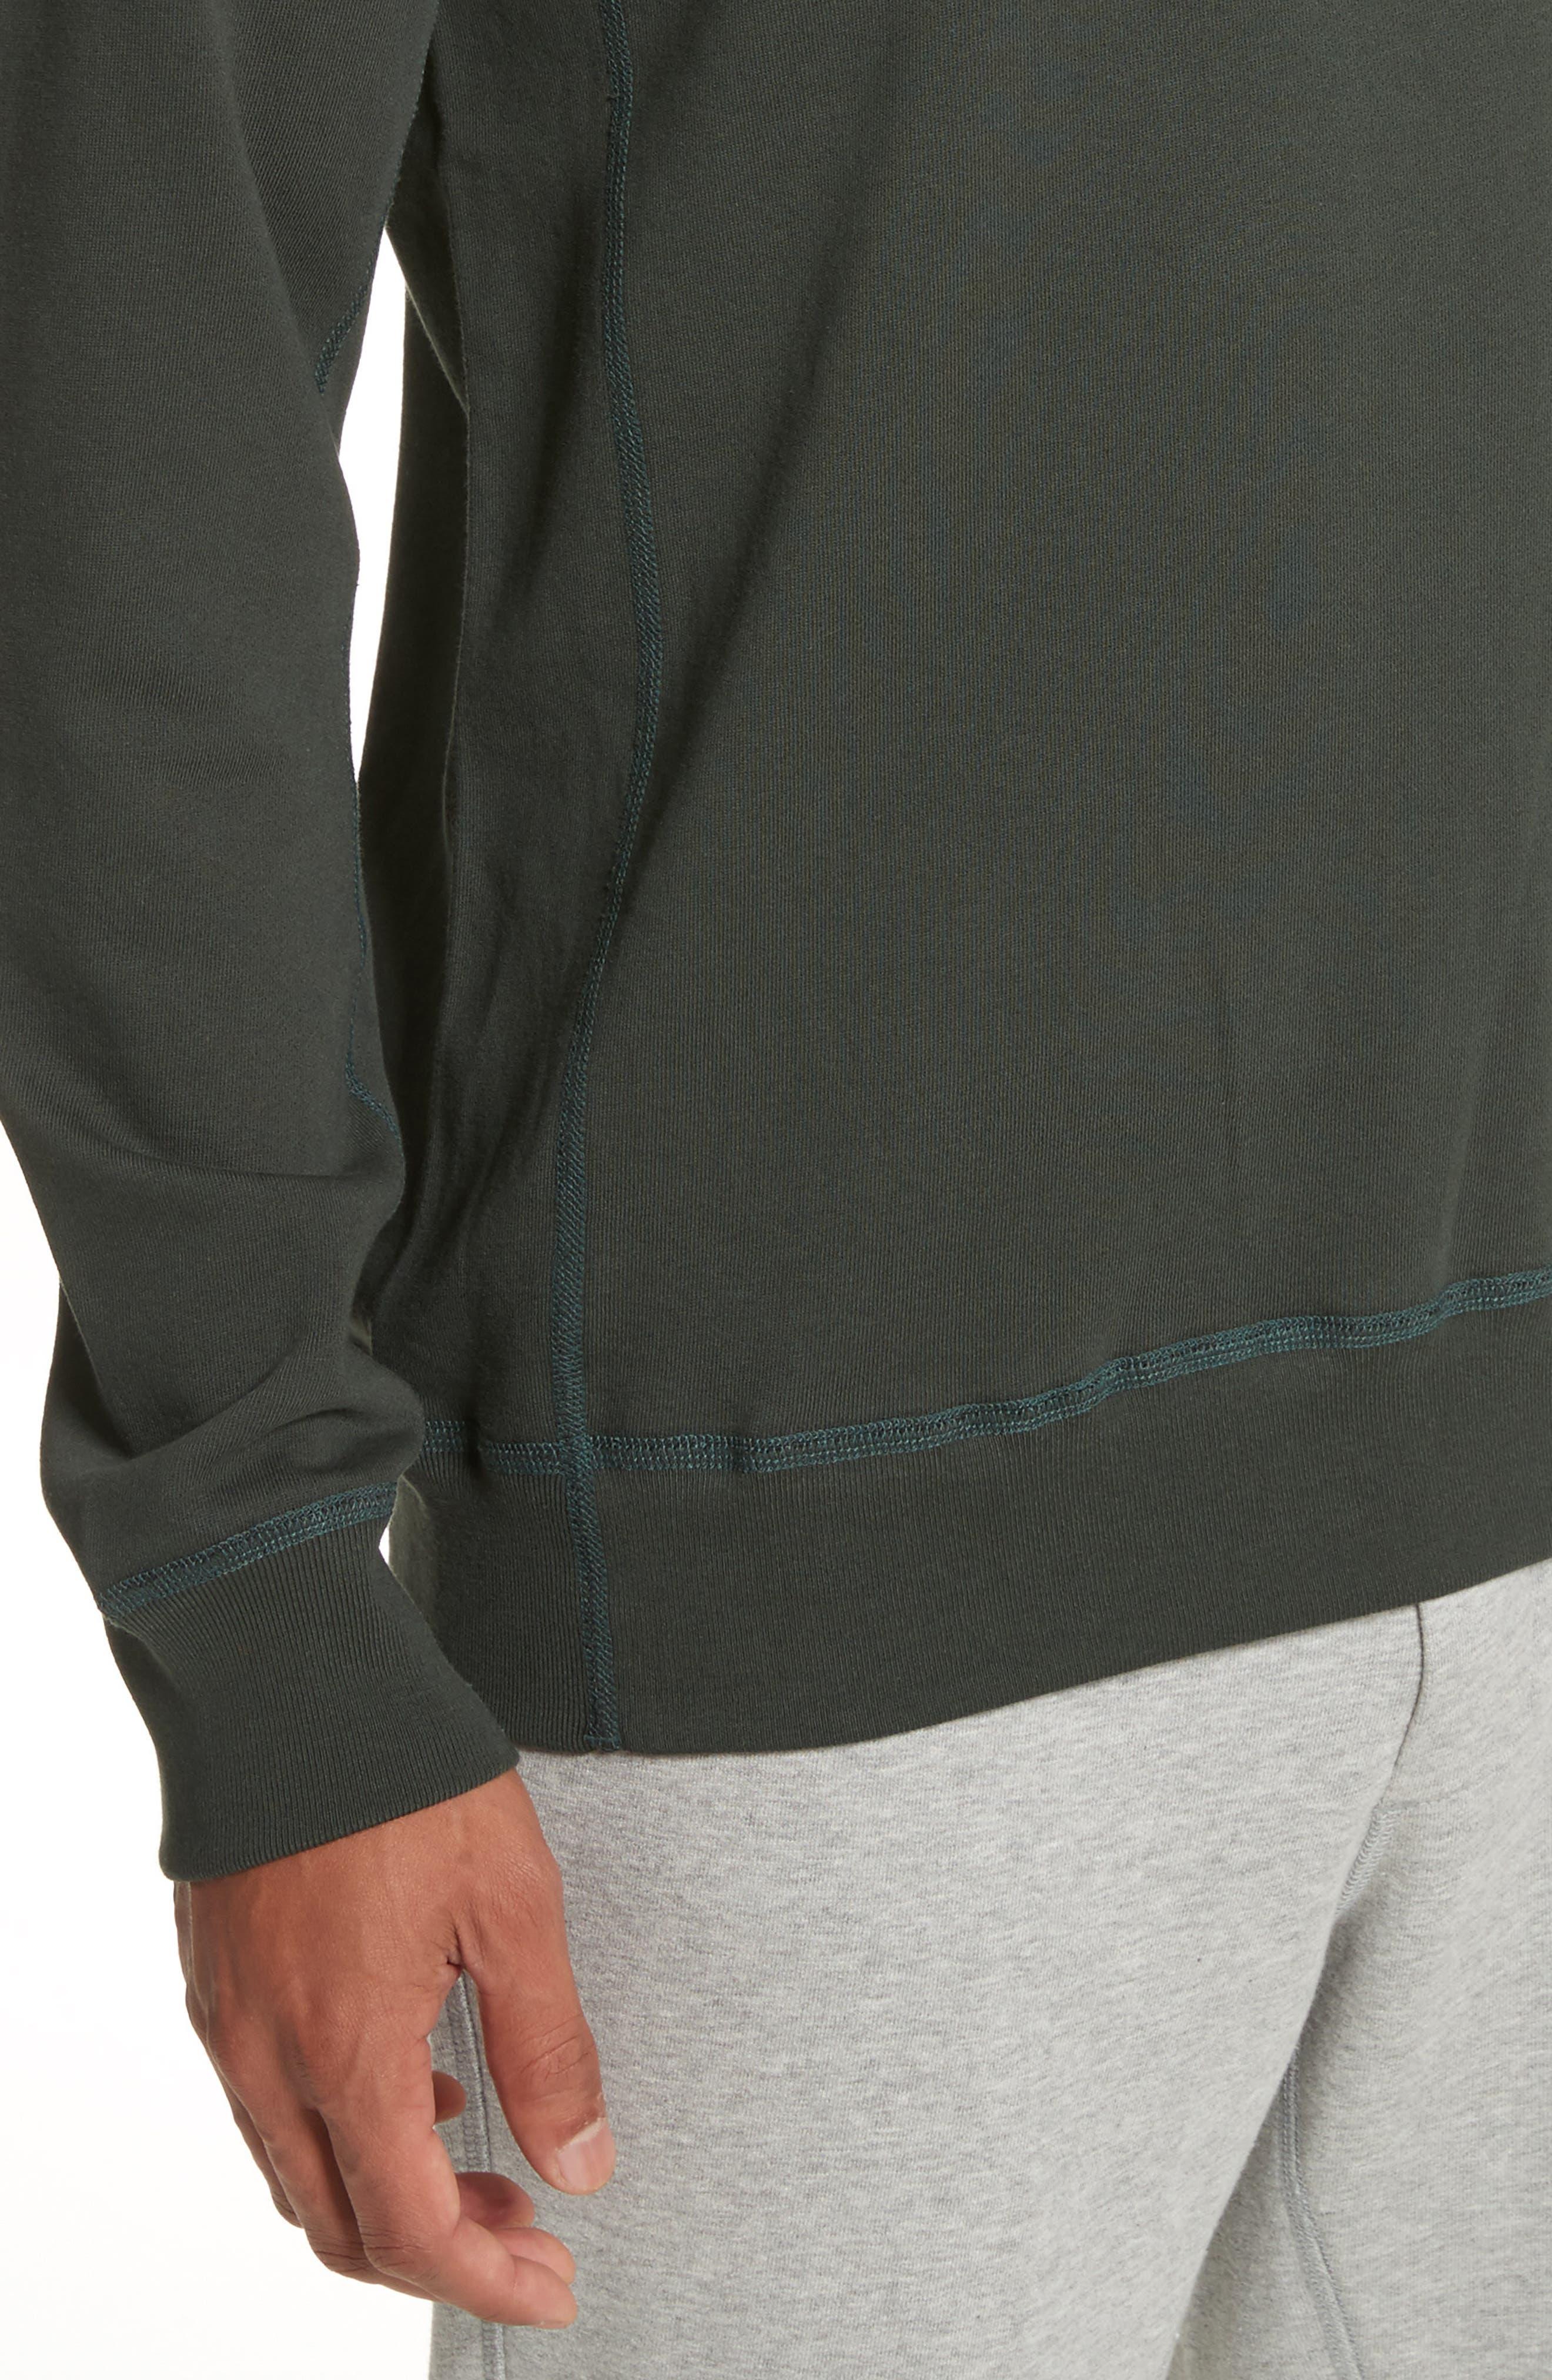 Crewneck Sweatshirt,                             Alternate thumbnail 4, color,                             Jungle Green